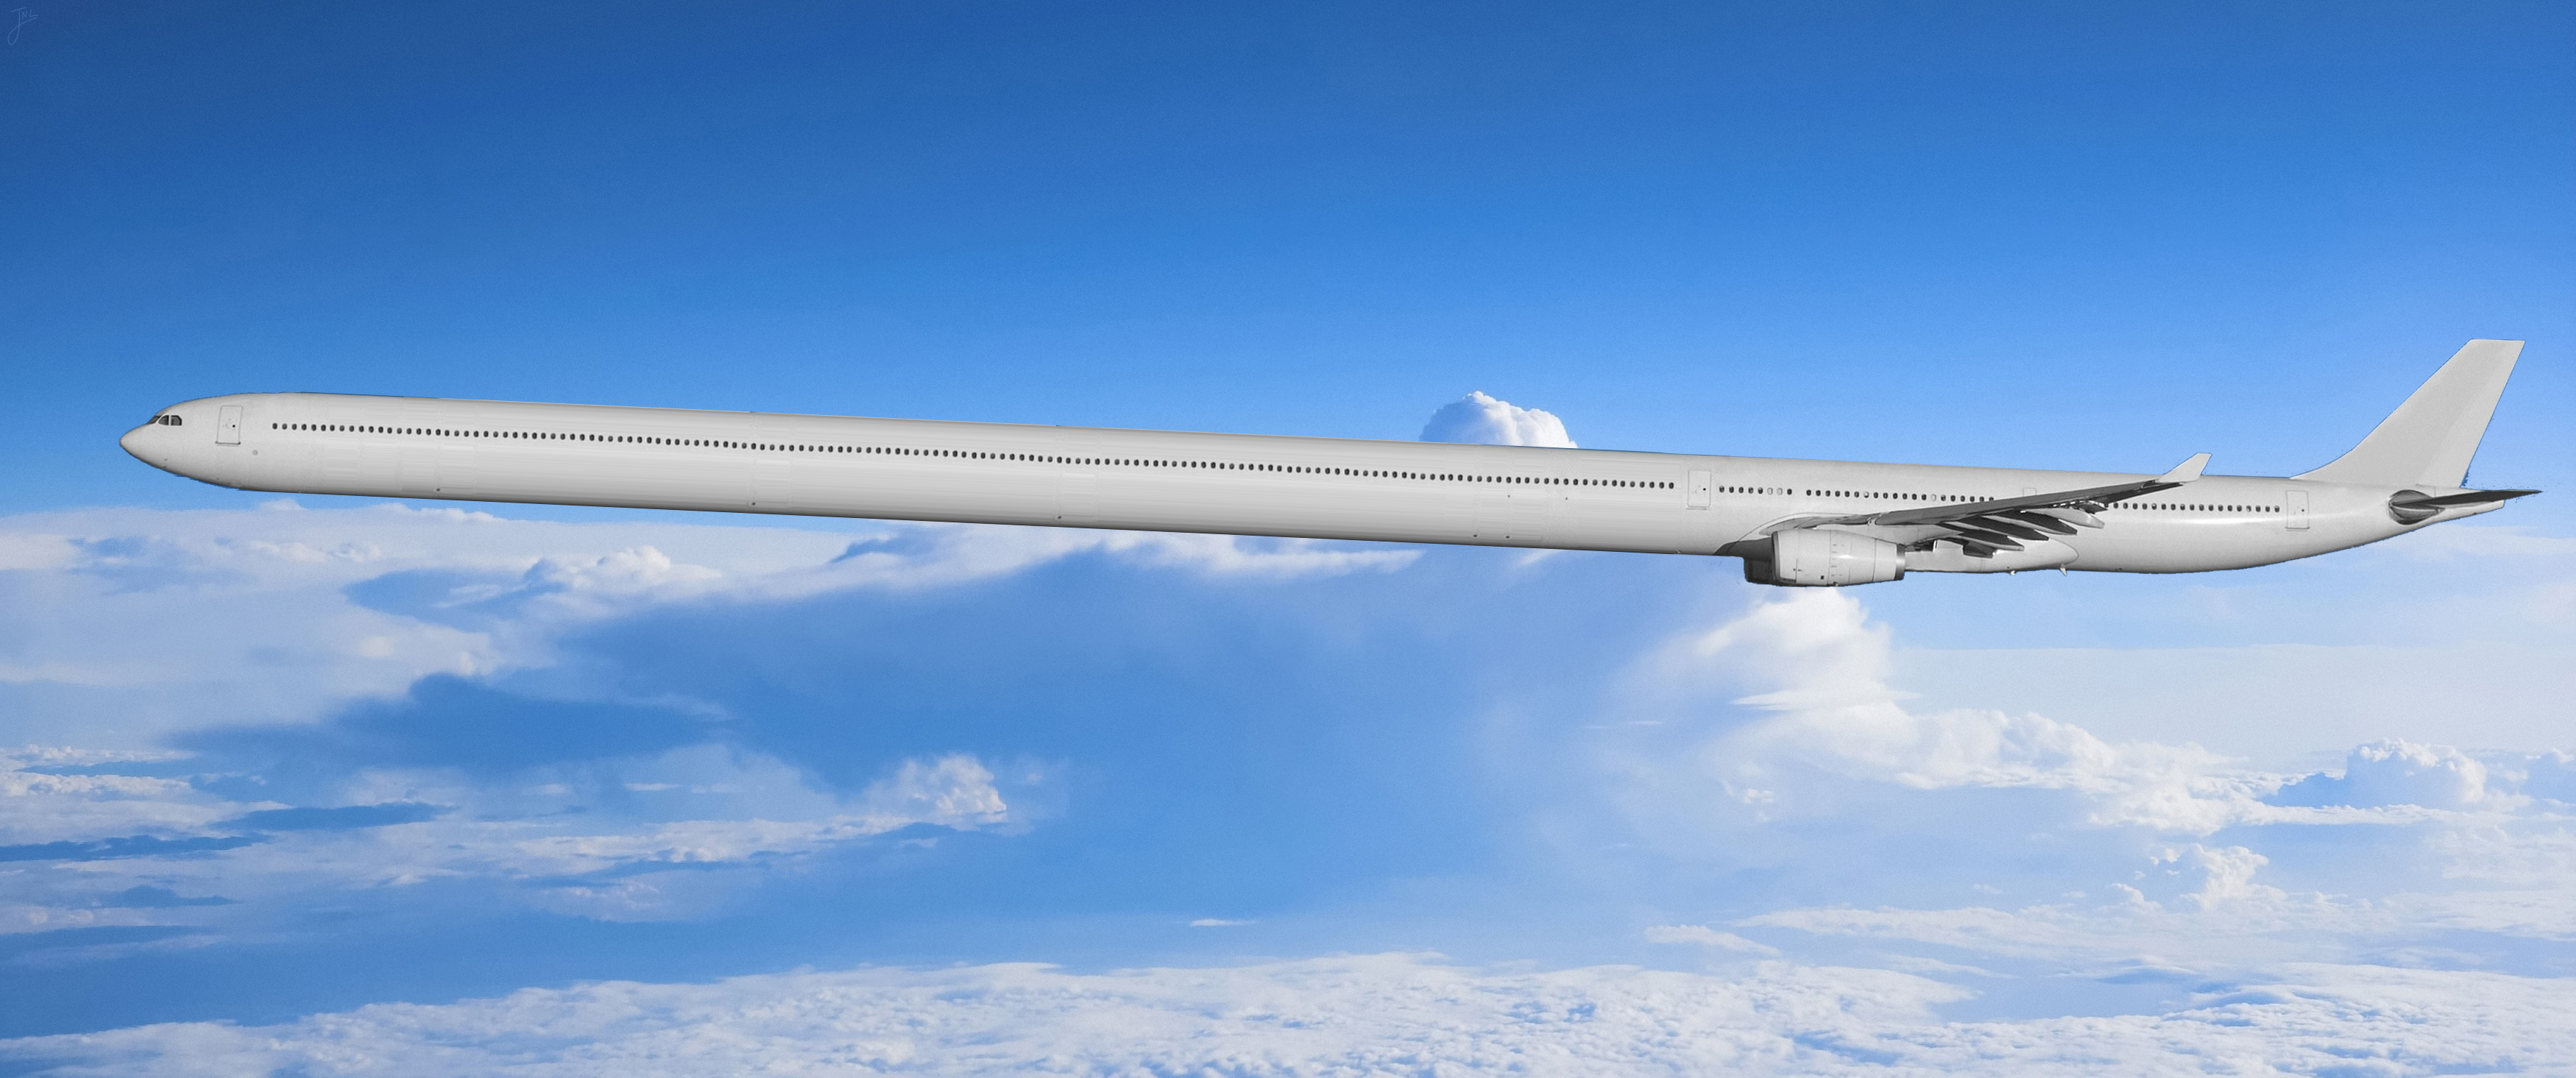 Planes trace photo